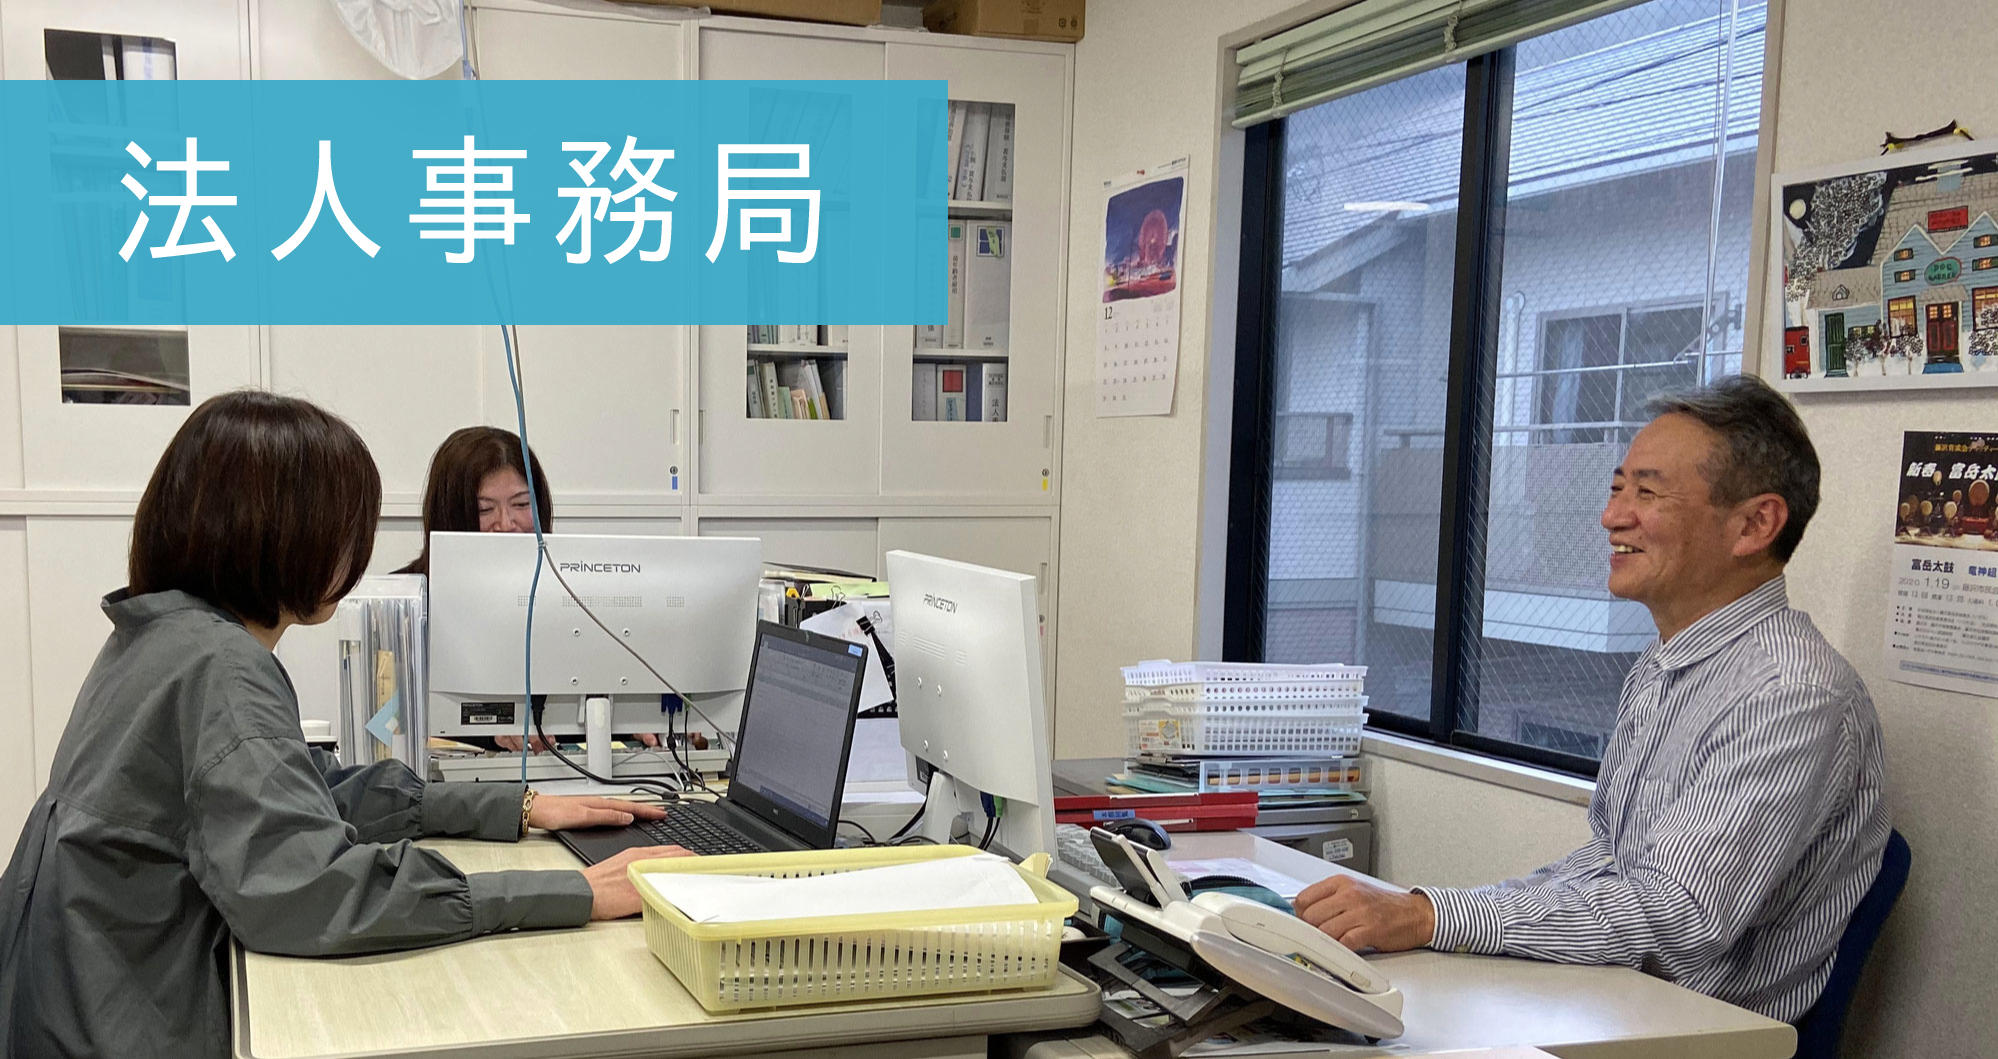 法人事務局の執務室